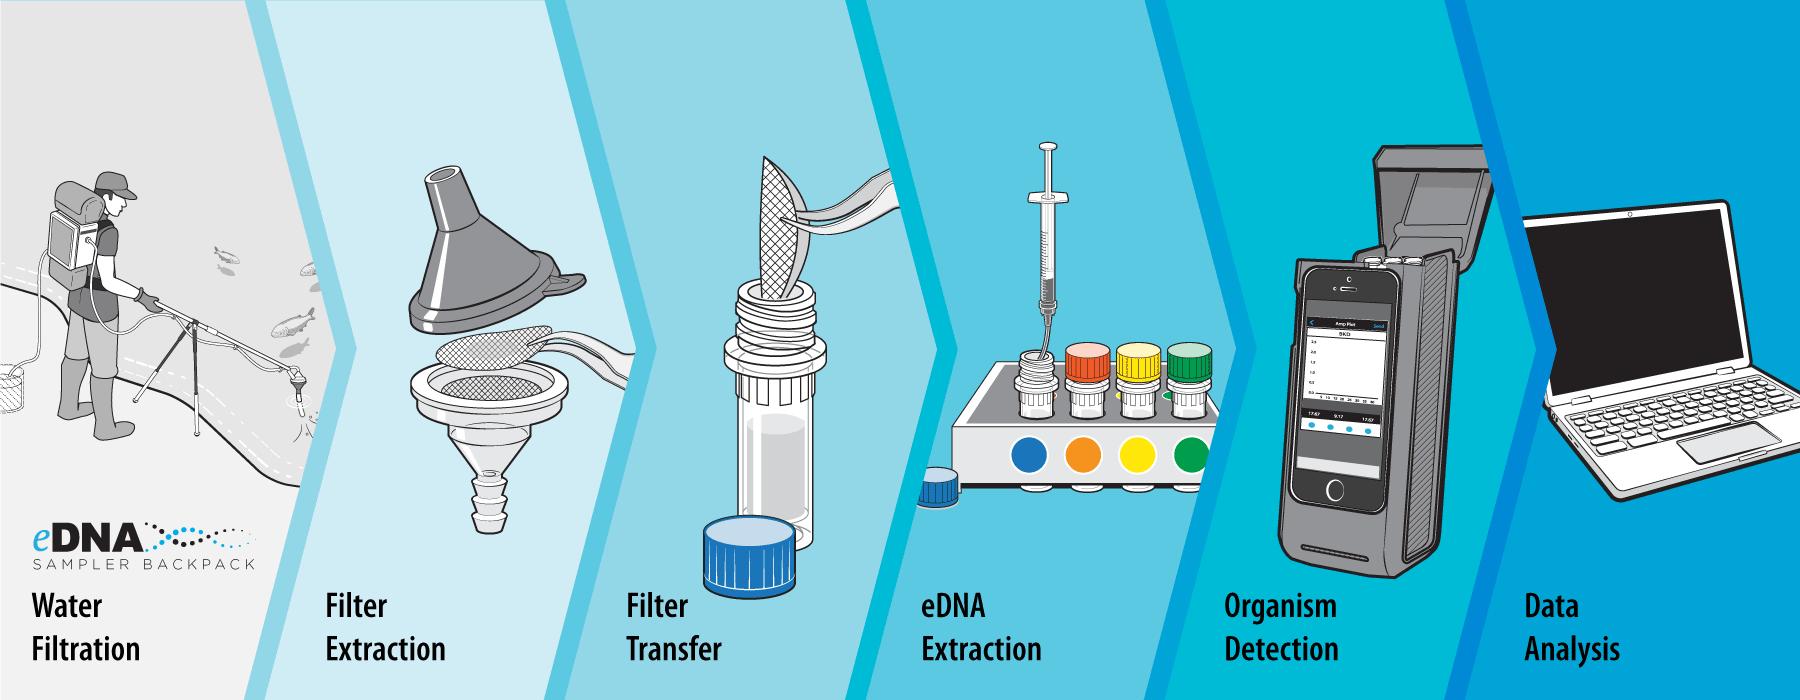 buy new developments in science